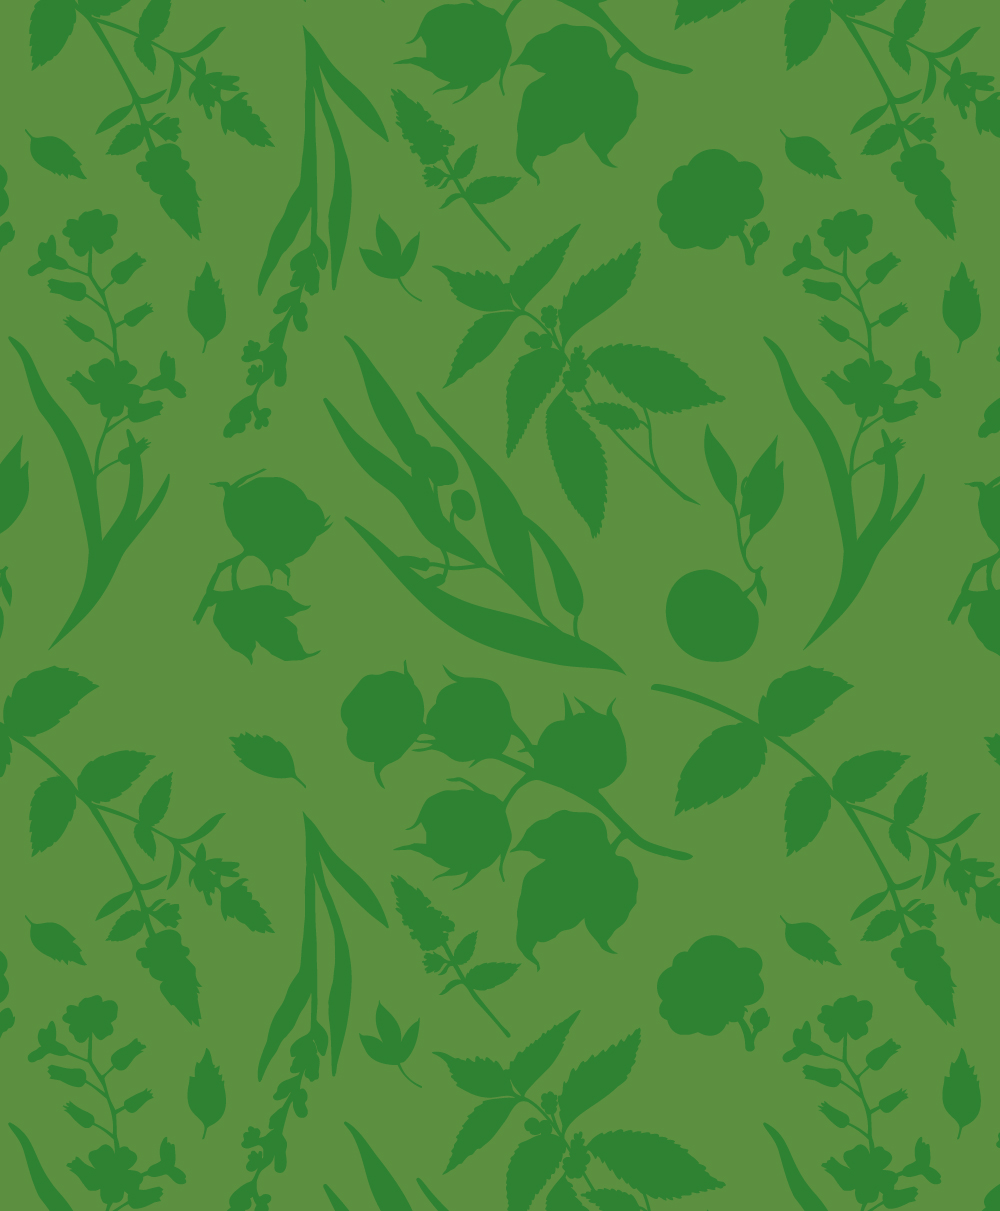 justbenice-BioMio-pattern-3.jpg